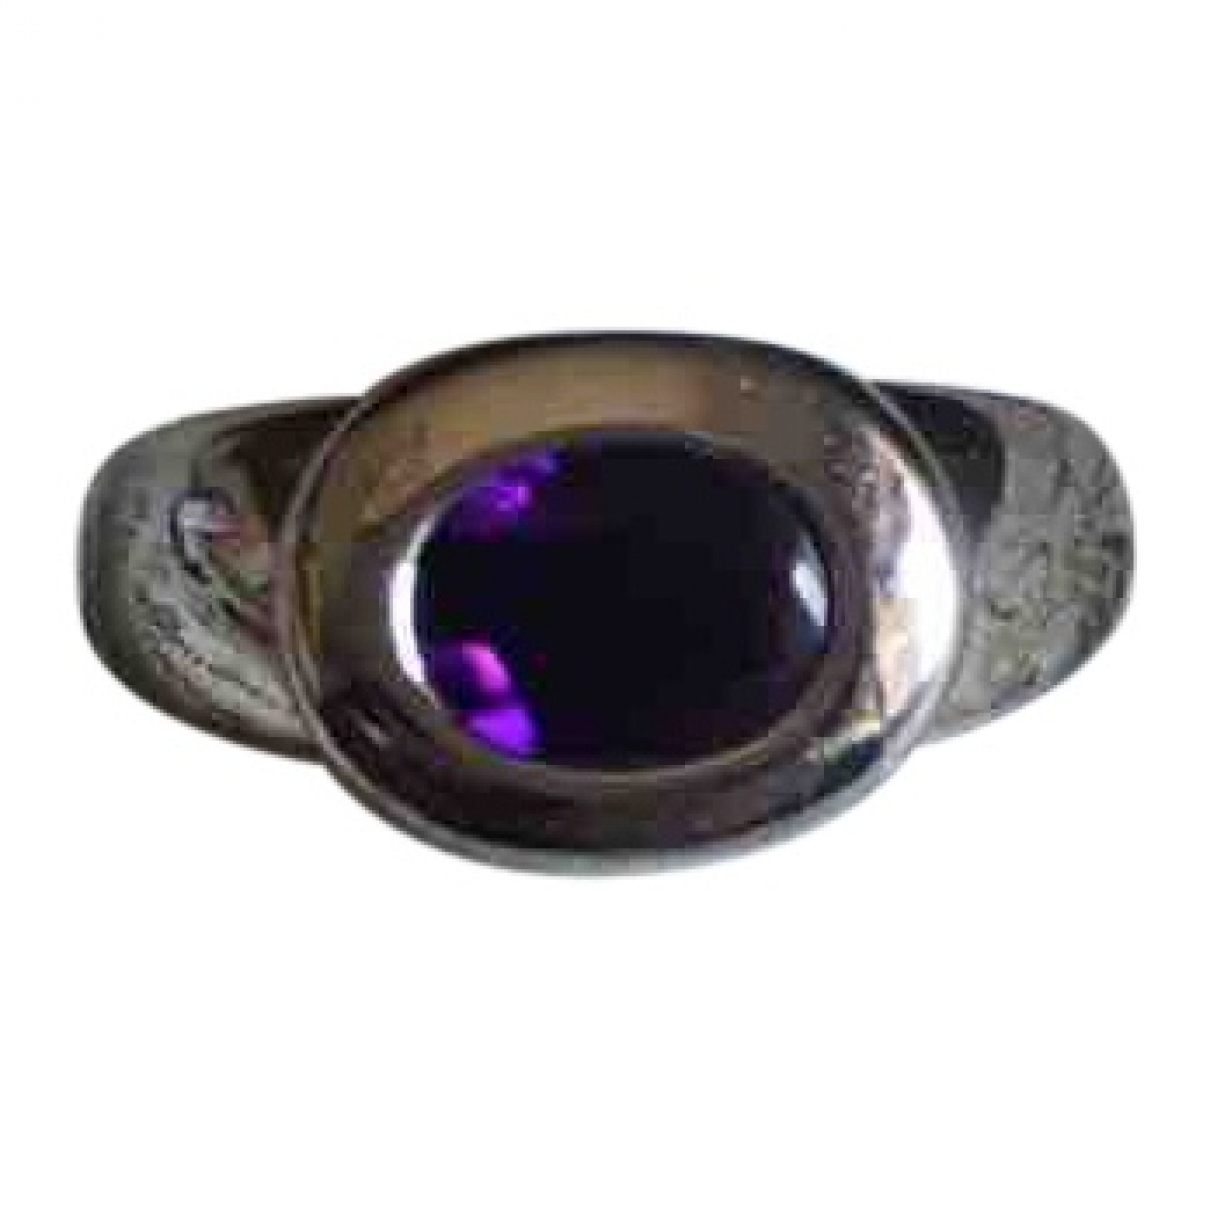 - Bague Amethyste pour femme en or blanc - violet